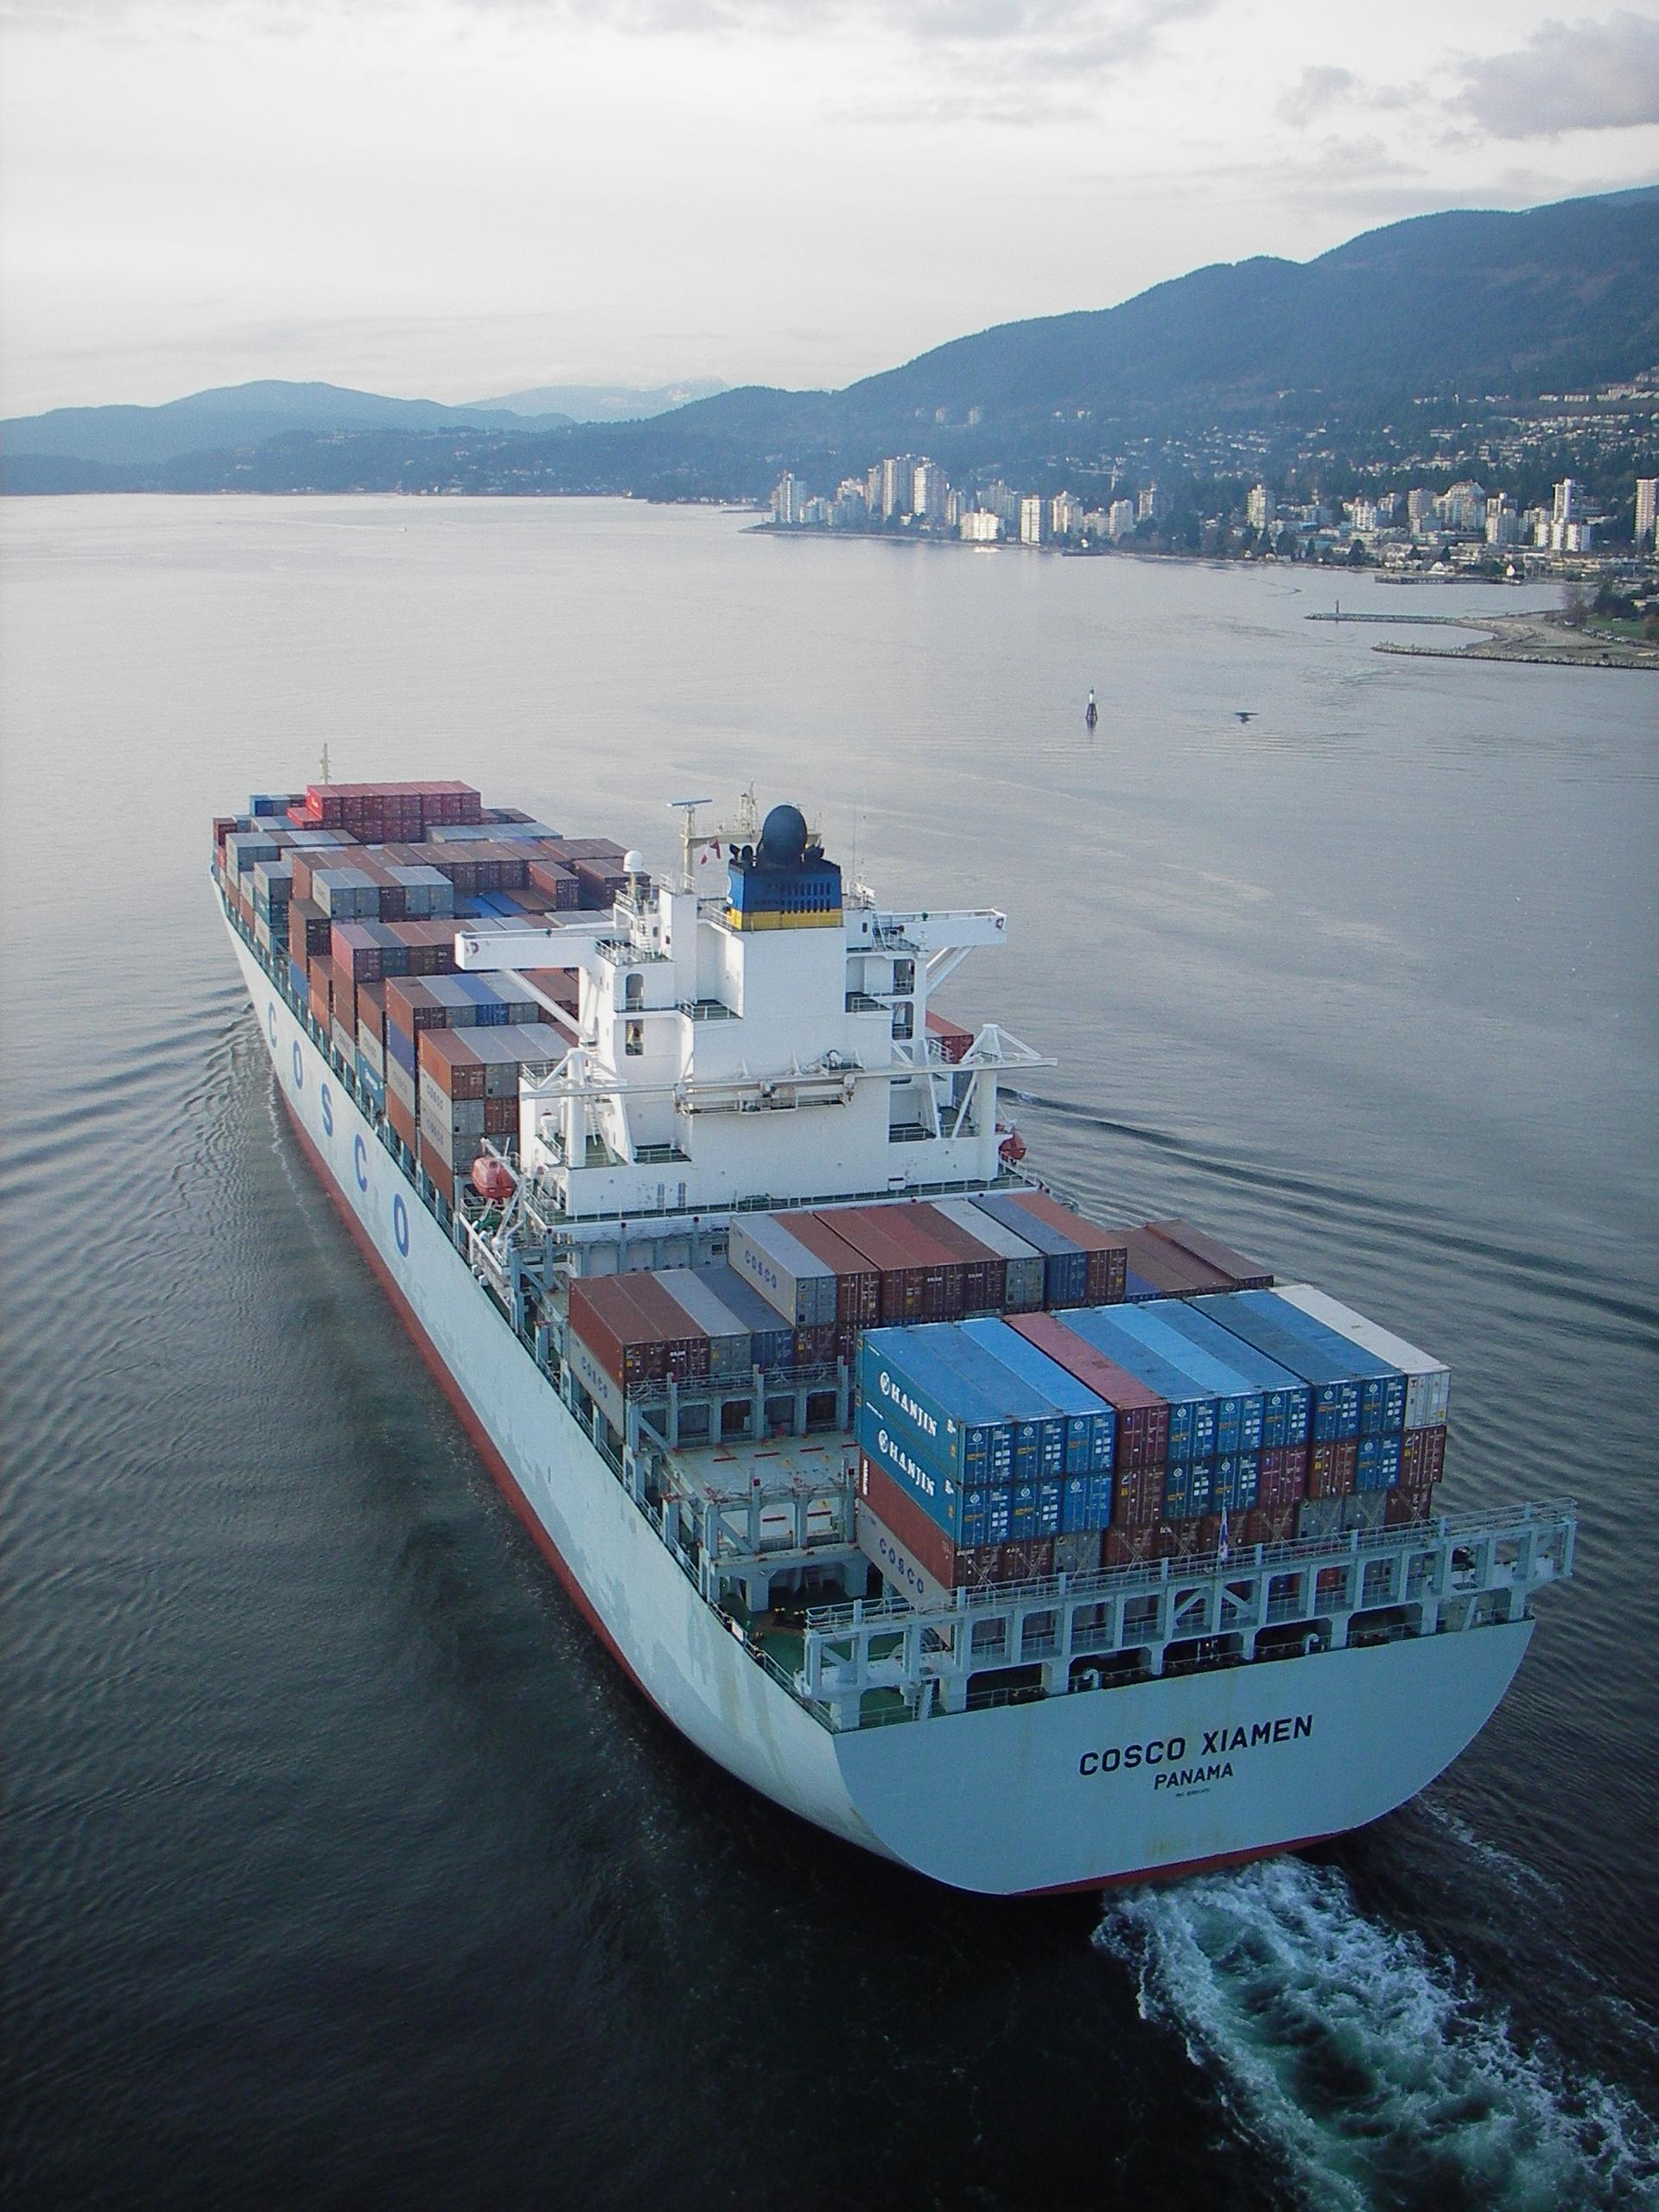 Containership Cosco Xiamen exiting Burrard Inlet (Vancouver's harbour)